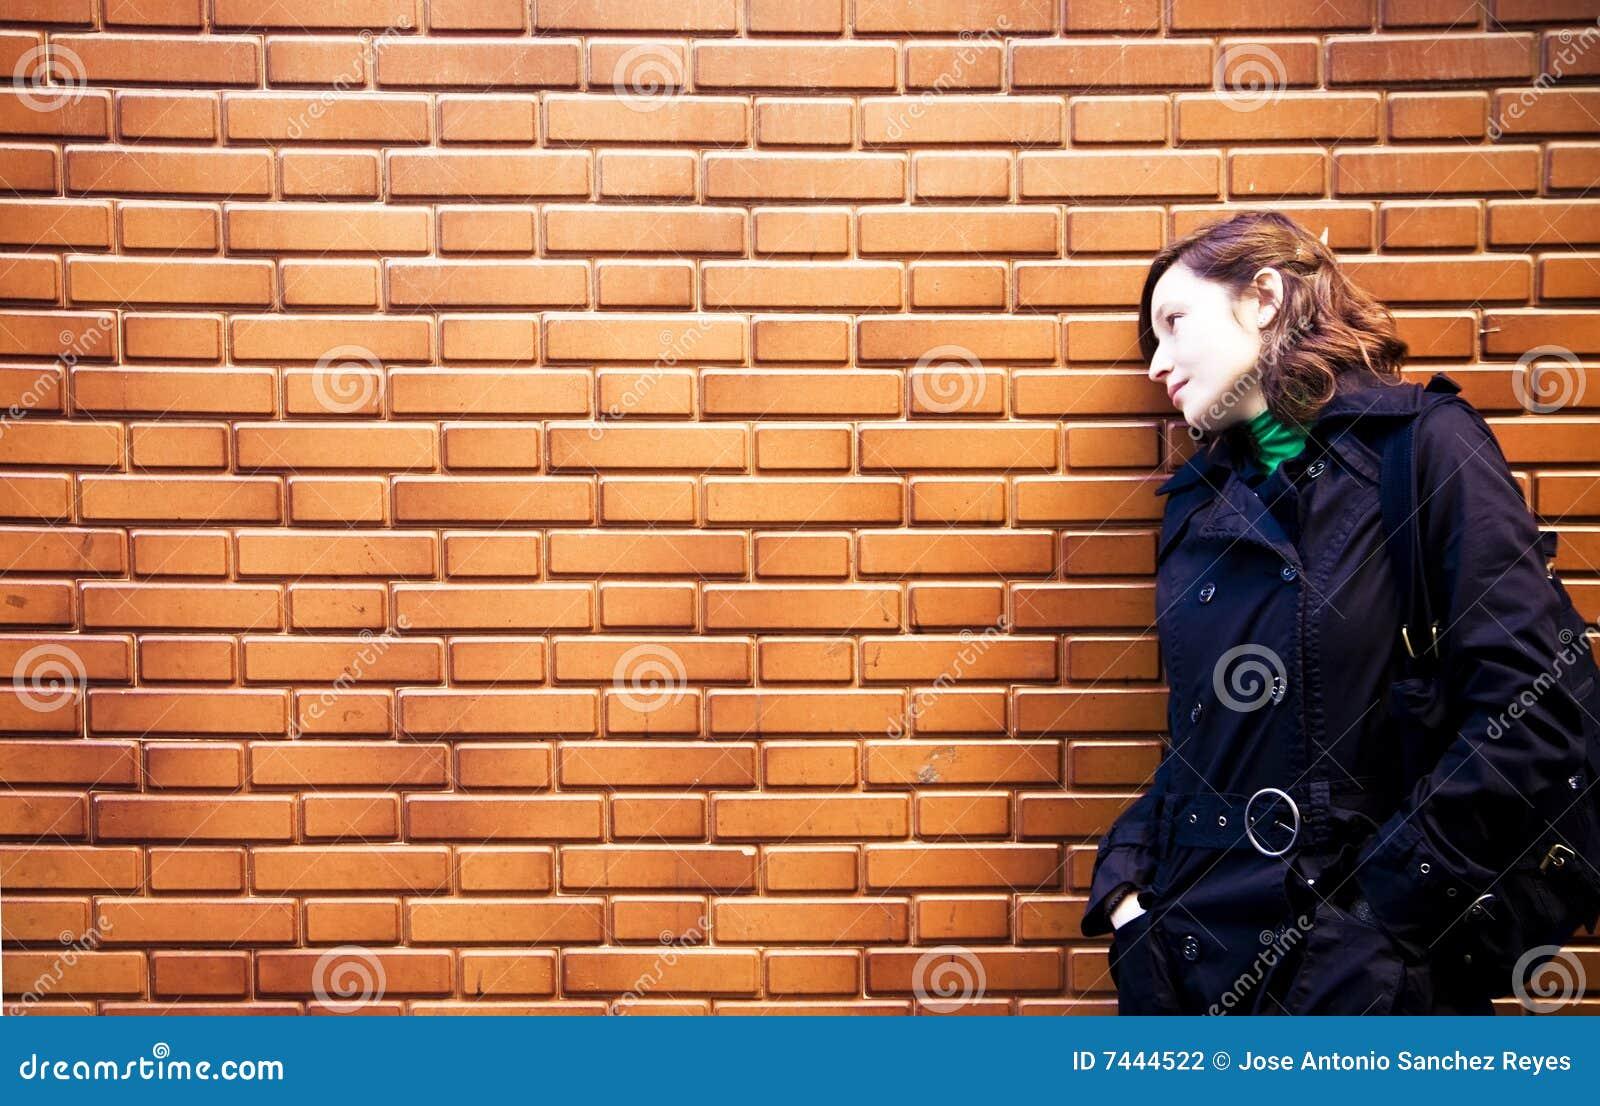 Mujer en brickwall